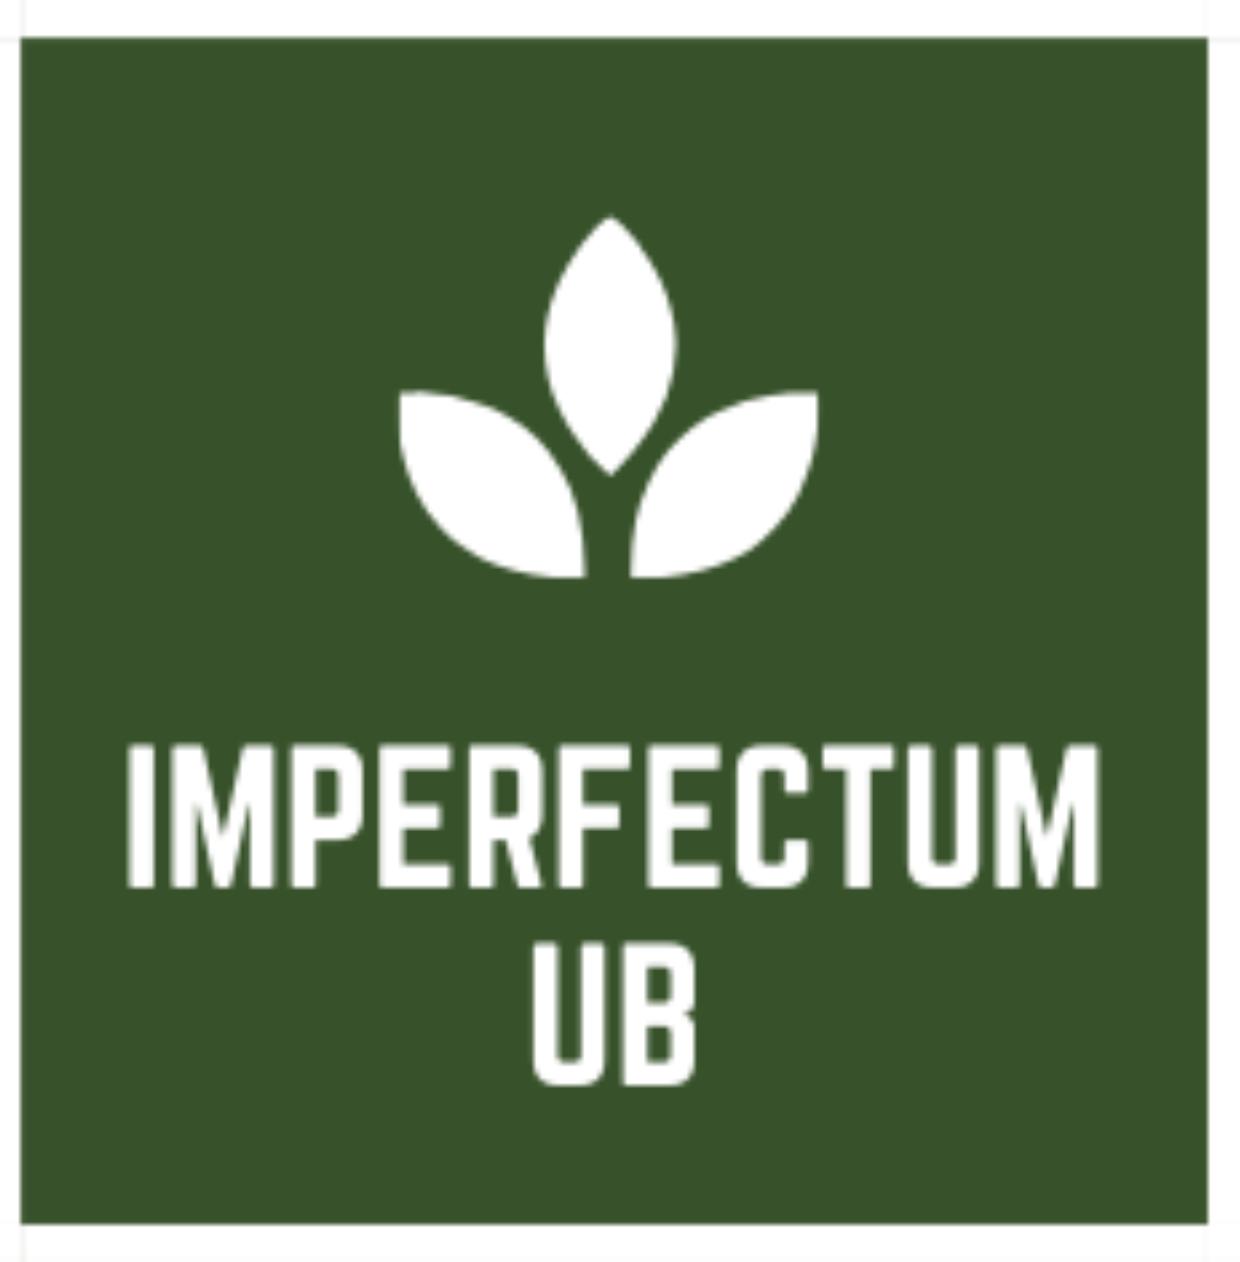 Imperfectum logo Rogaland